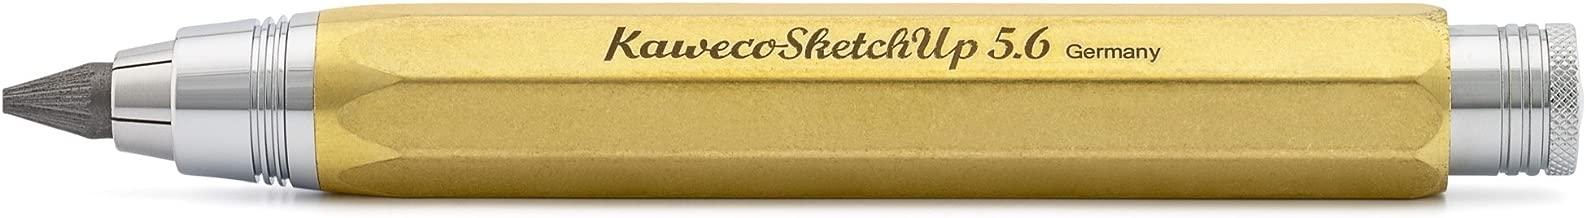 kaweco clutch pencil